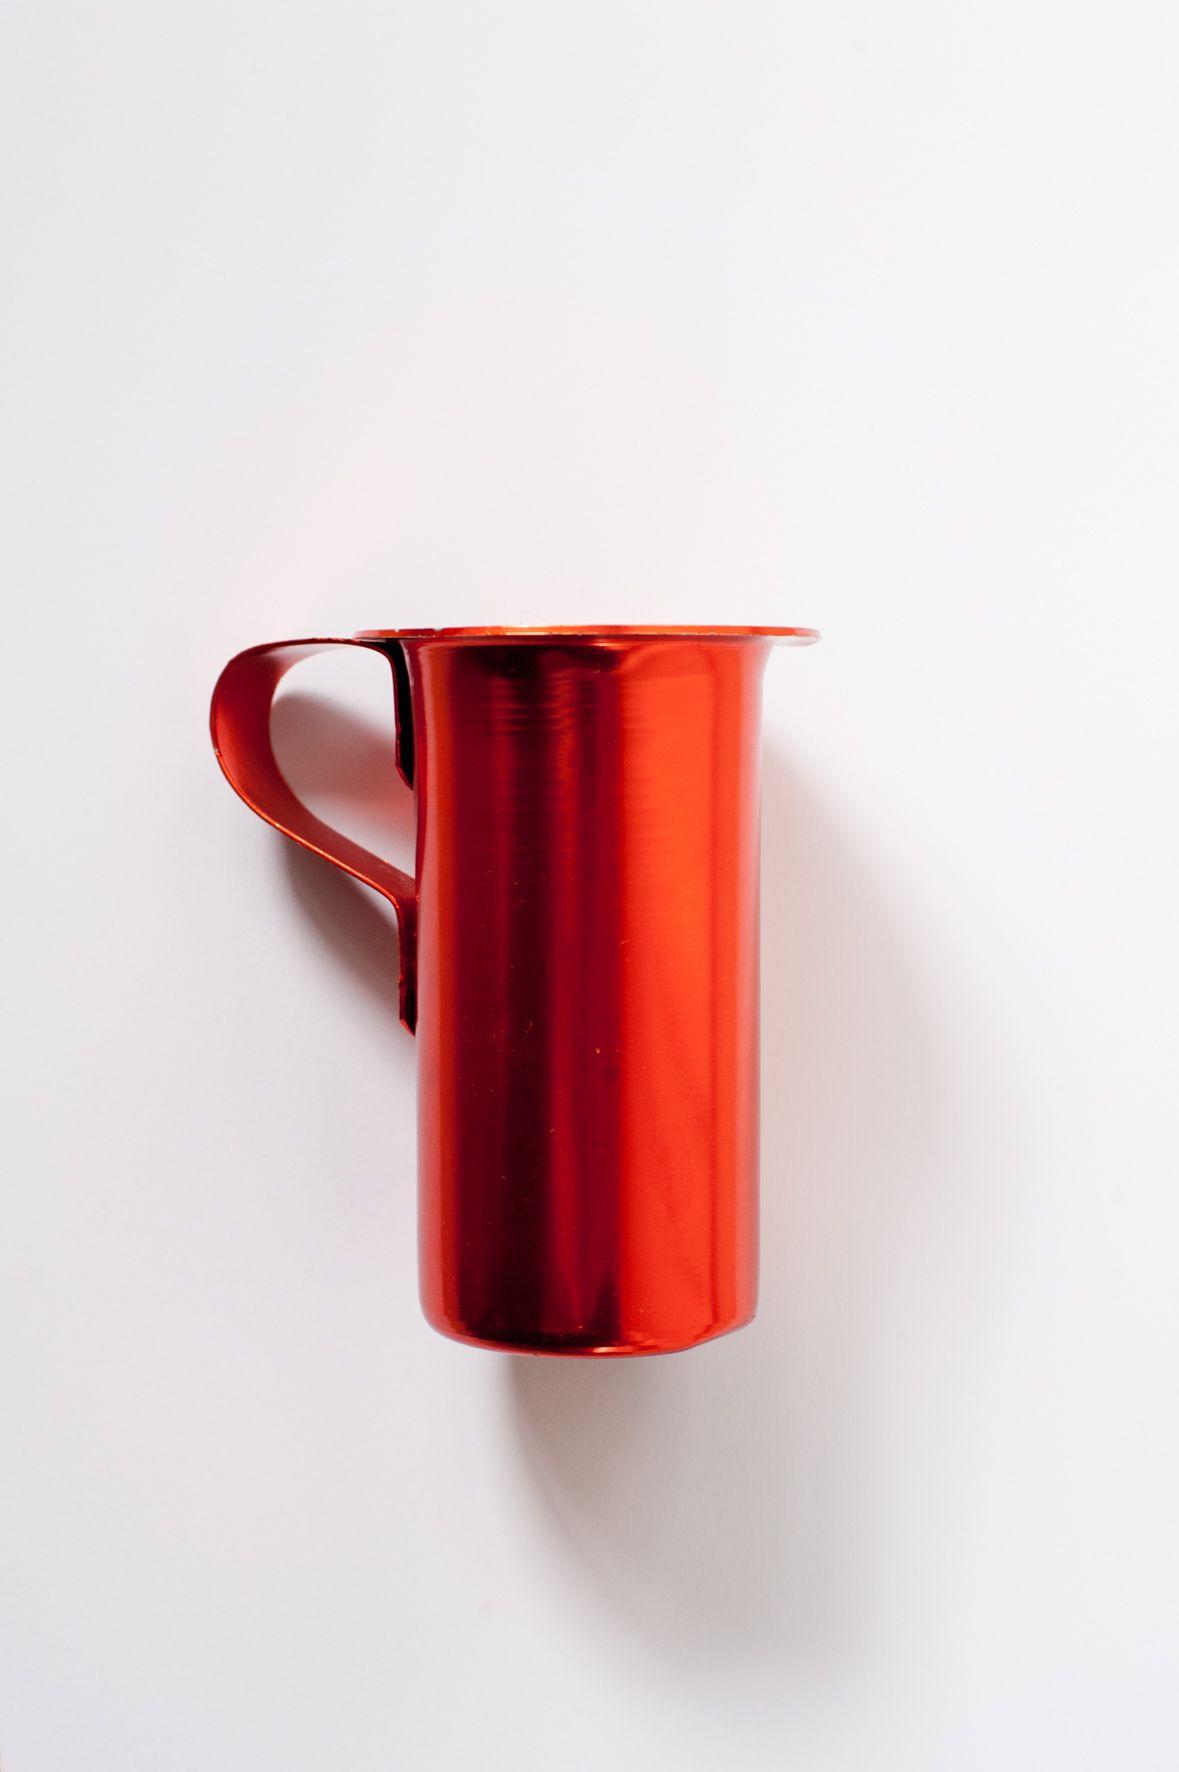 copper coloured carafe kitchen decor glassware greek style on kitchen decor pitchers carafes id=12233